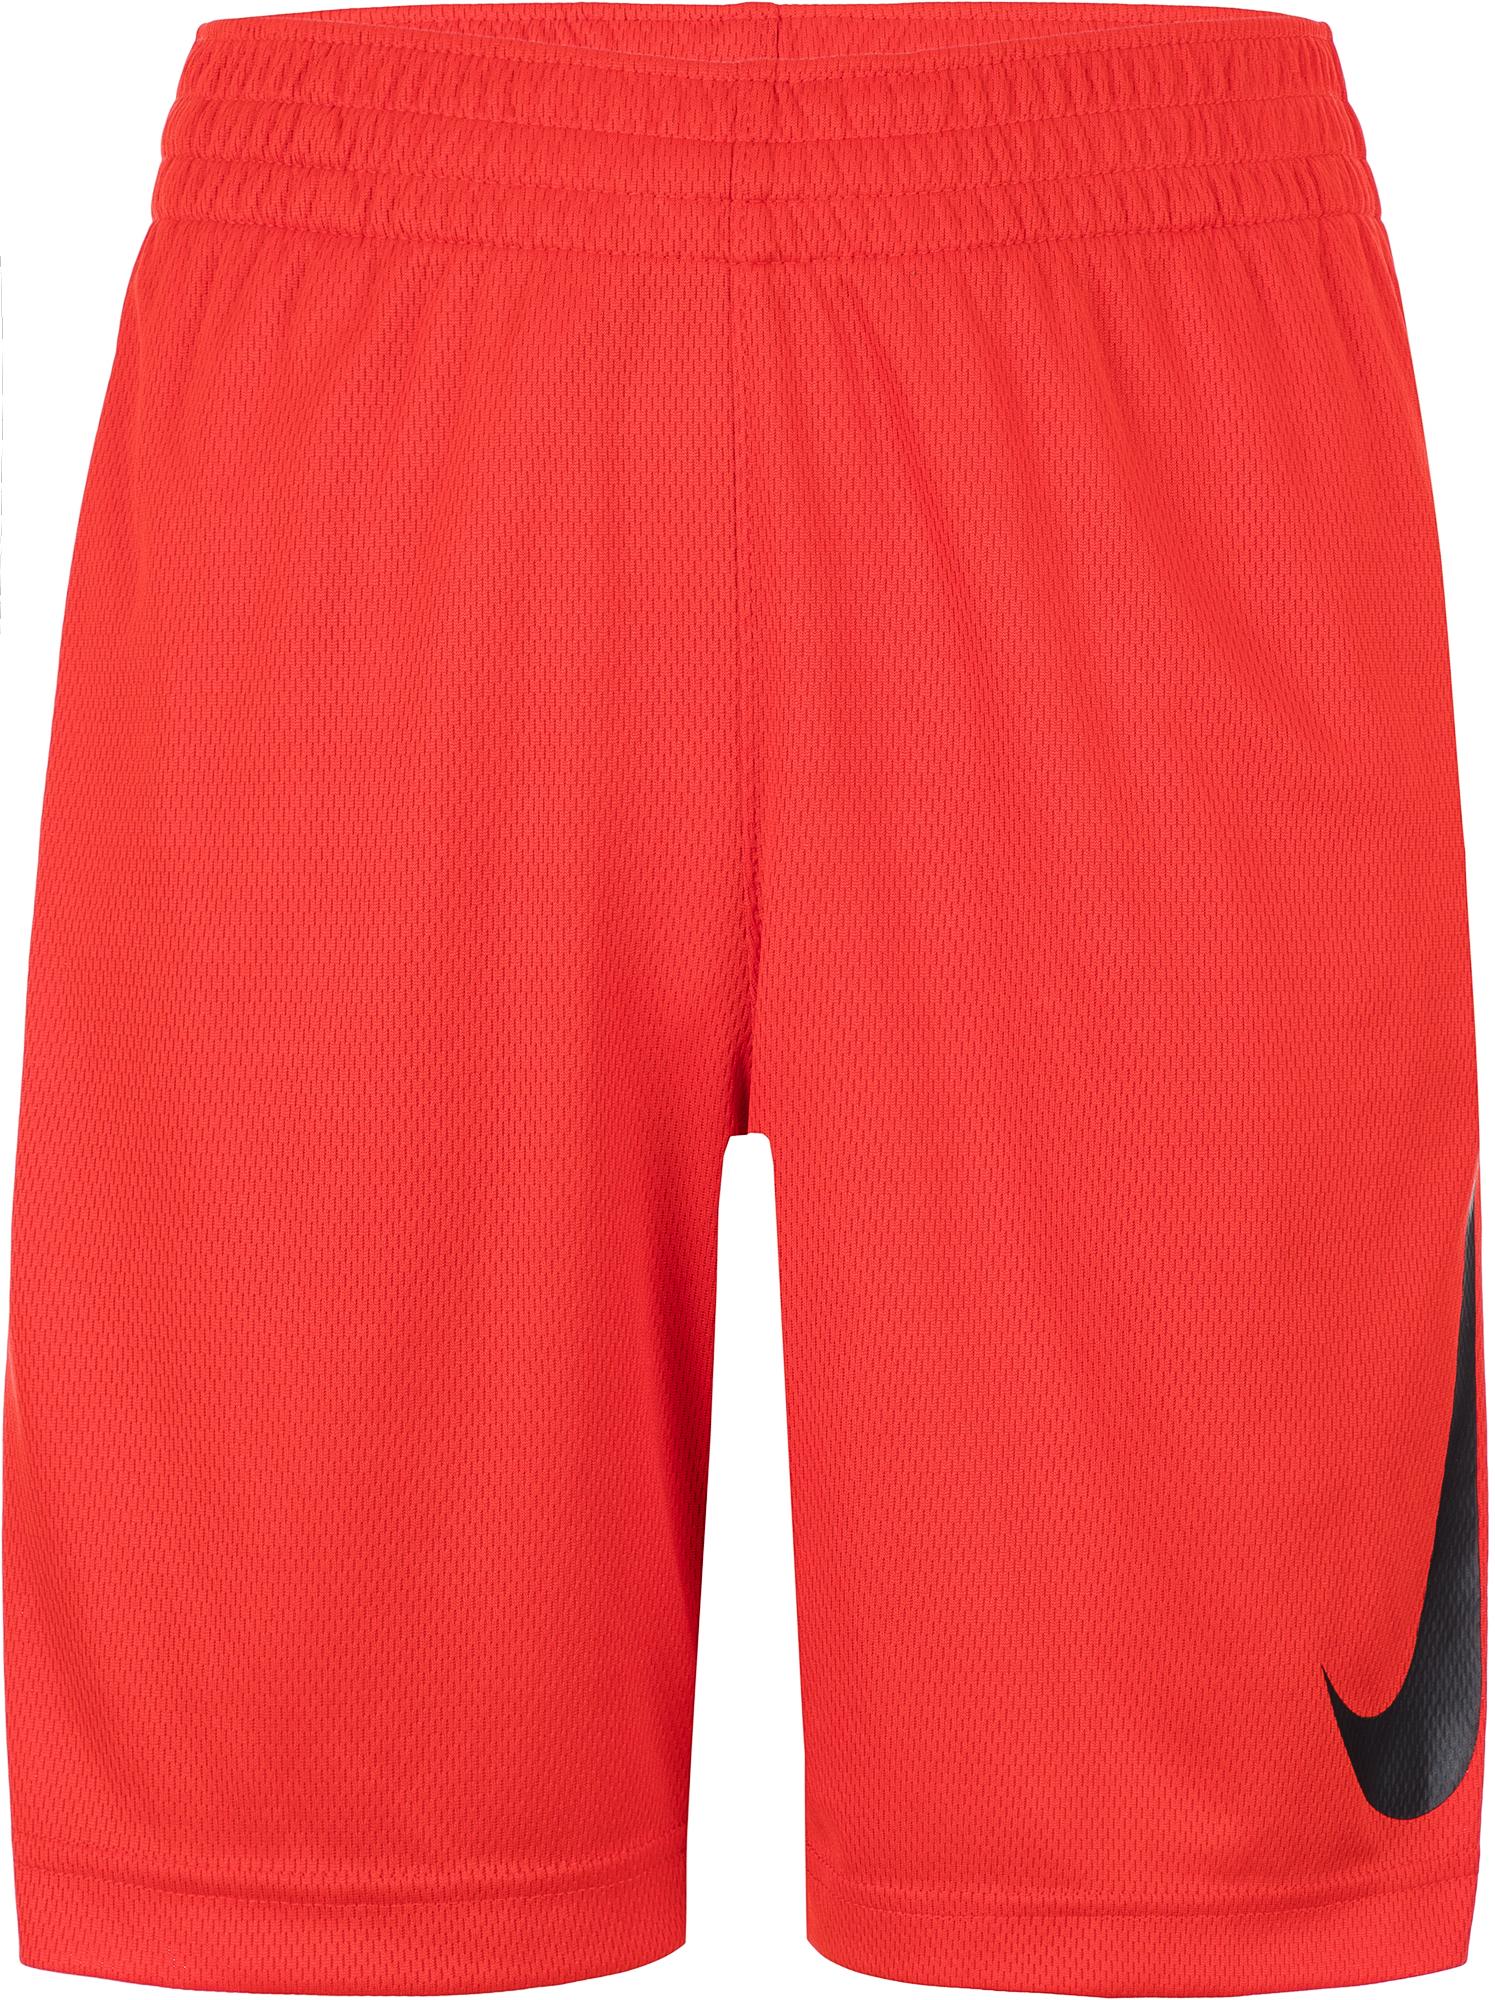 Nike Шорты для мальчиков Nike Dry, размер 158-170